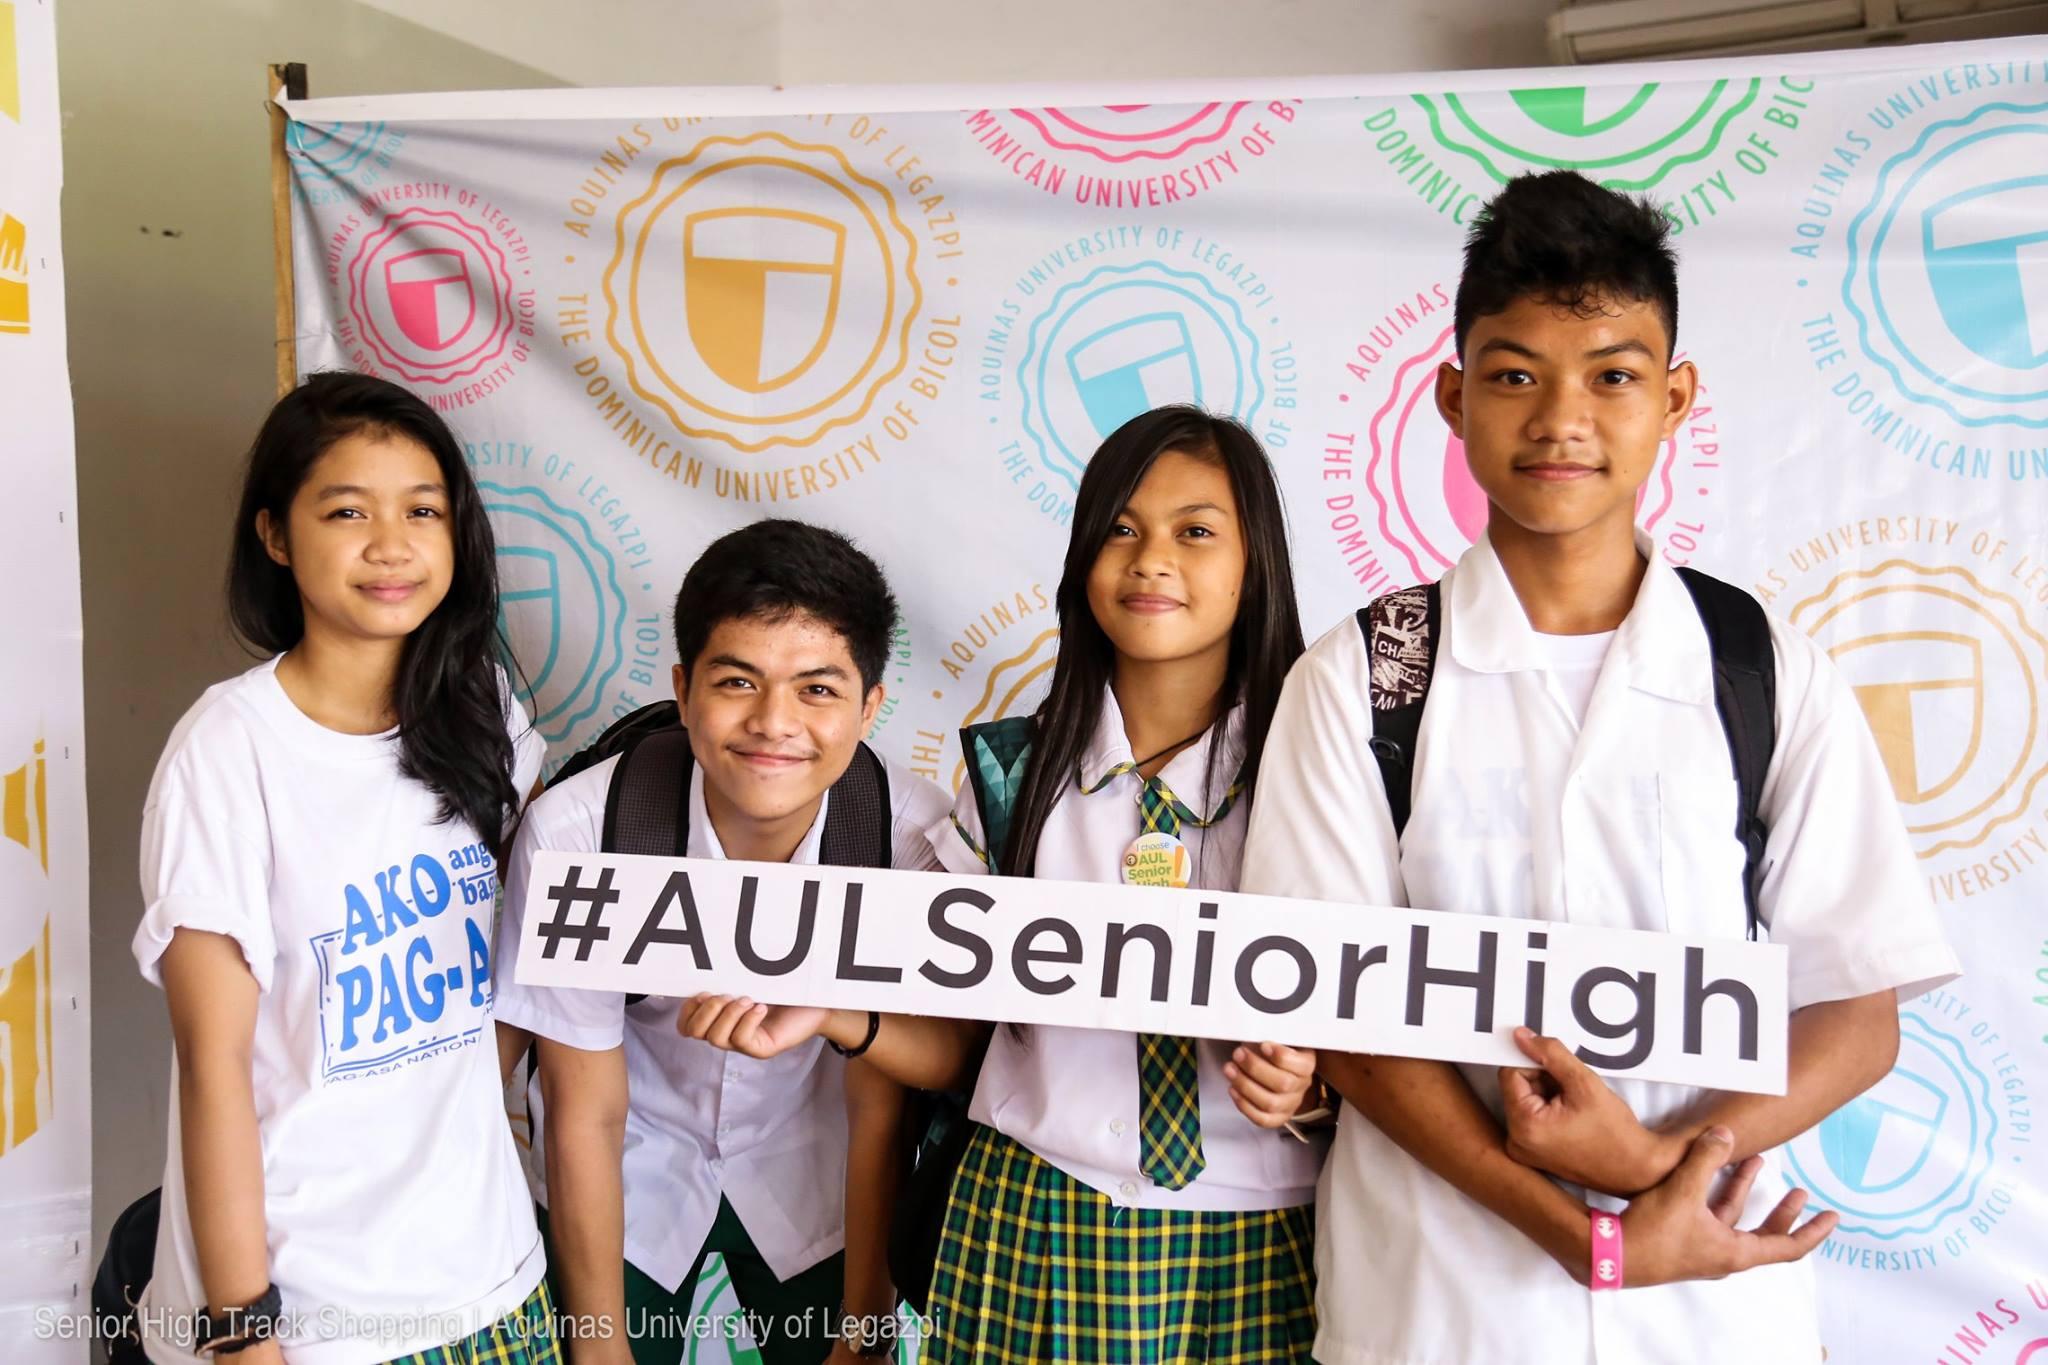 AUL Senior High Track Shopping